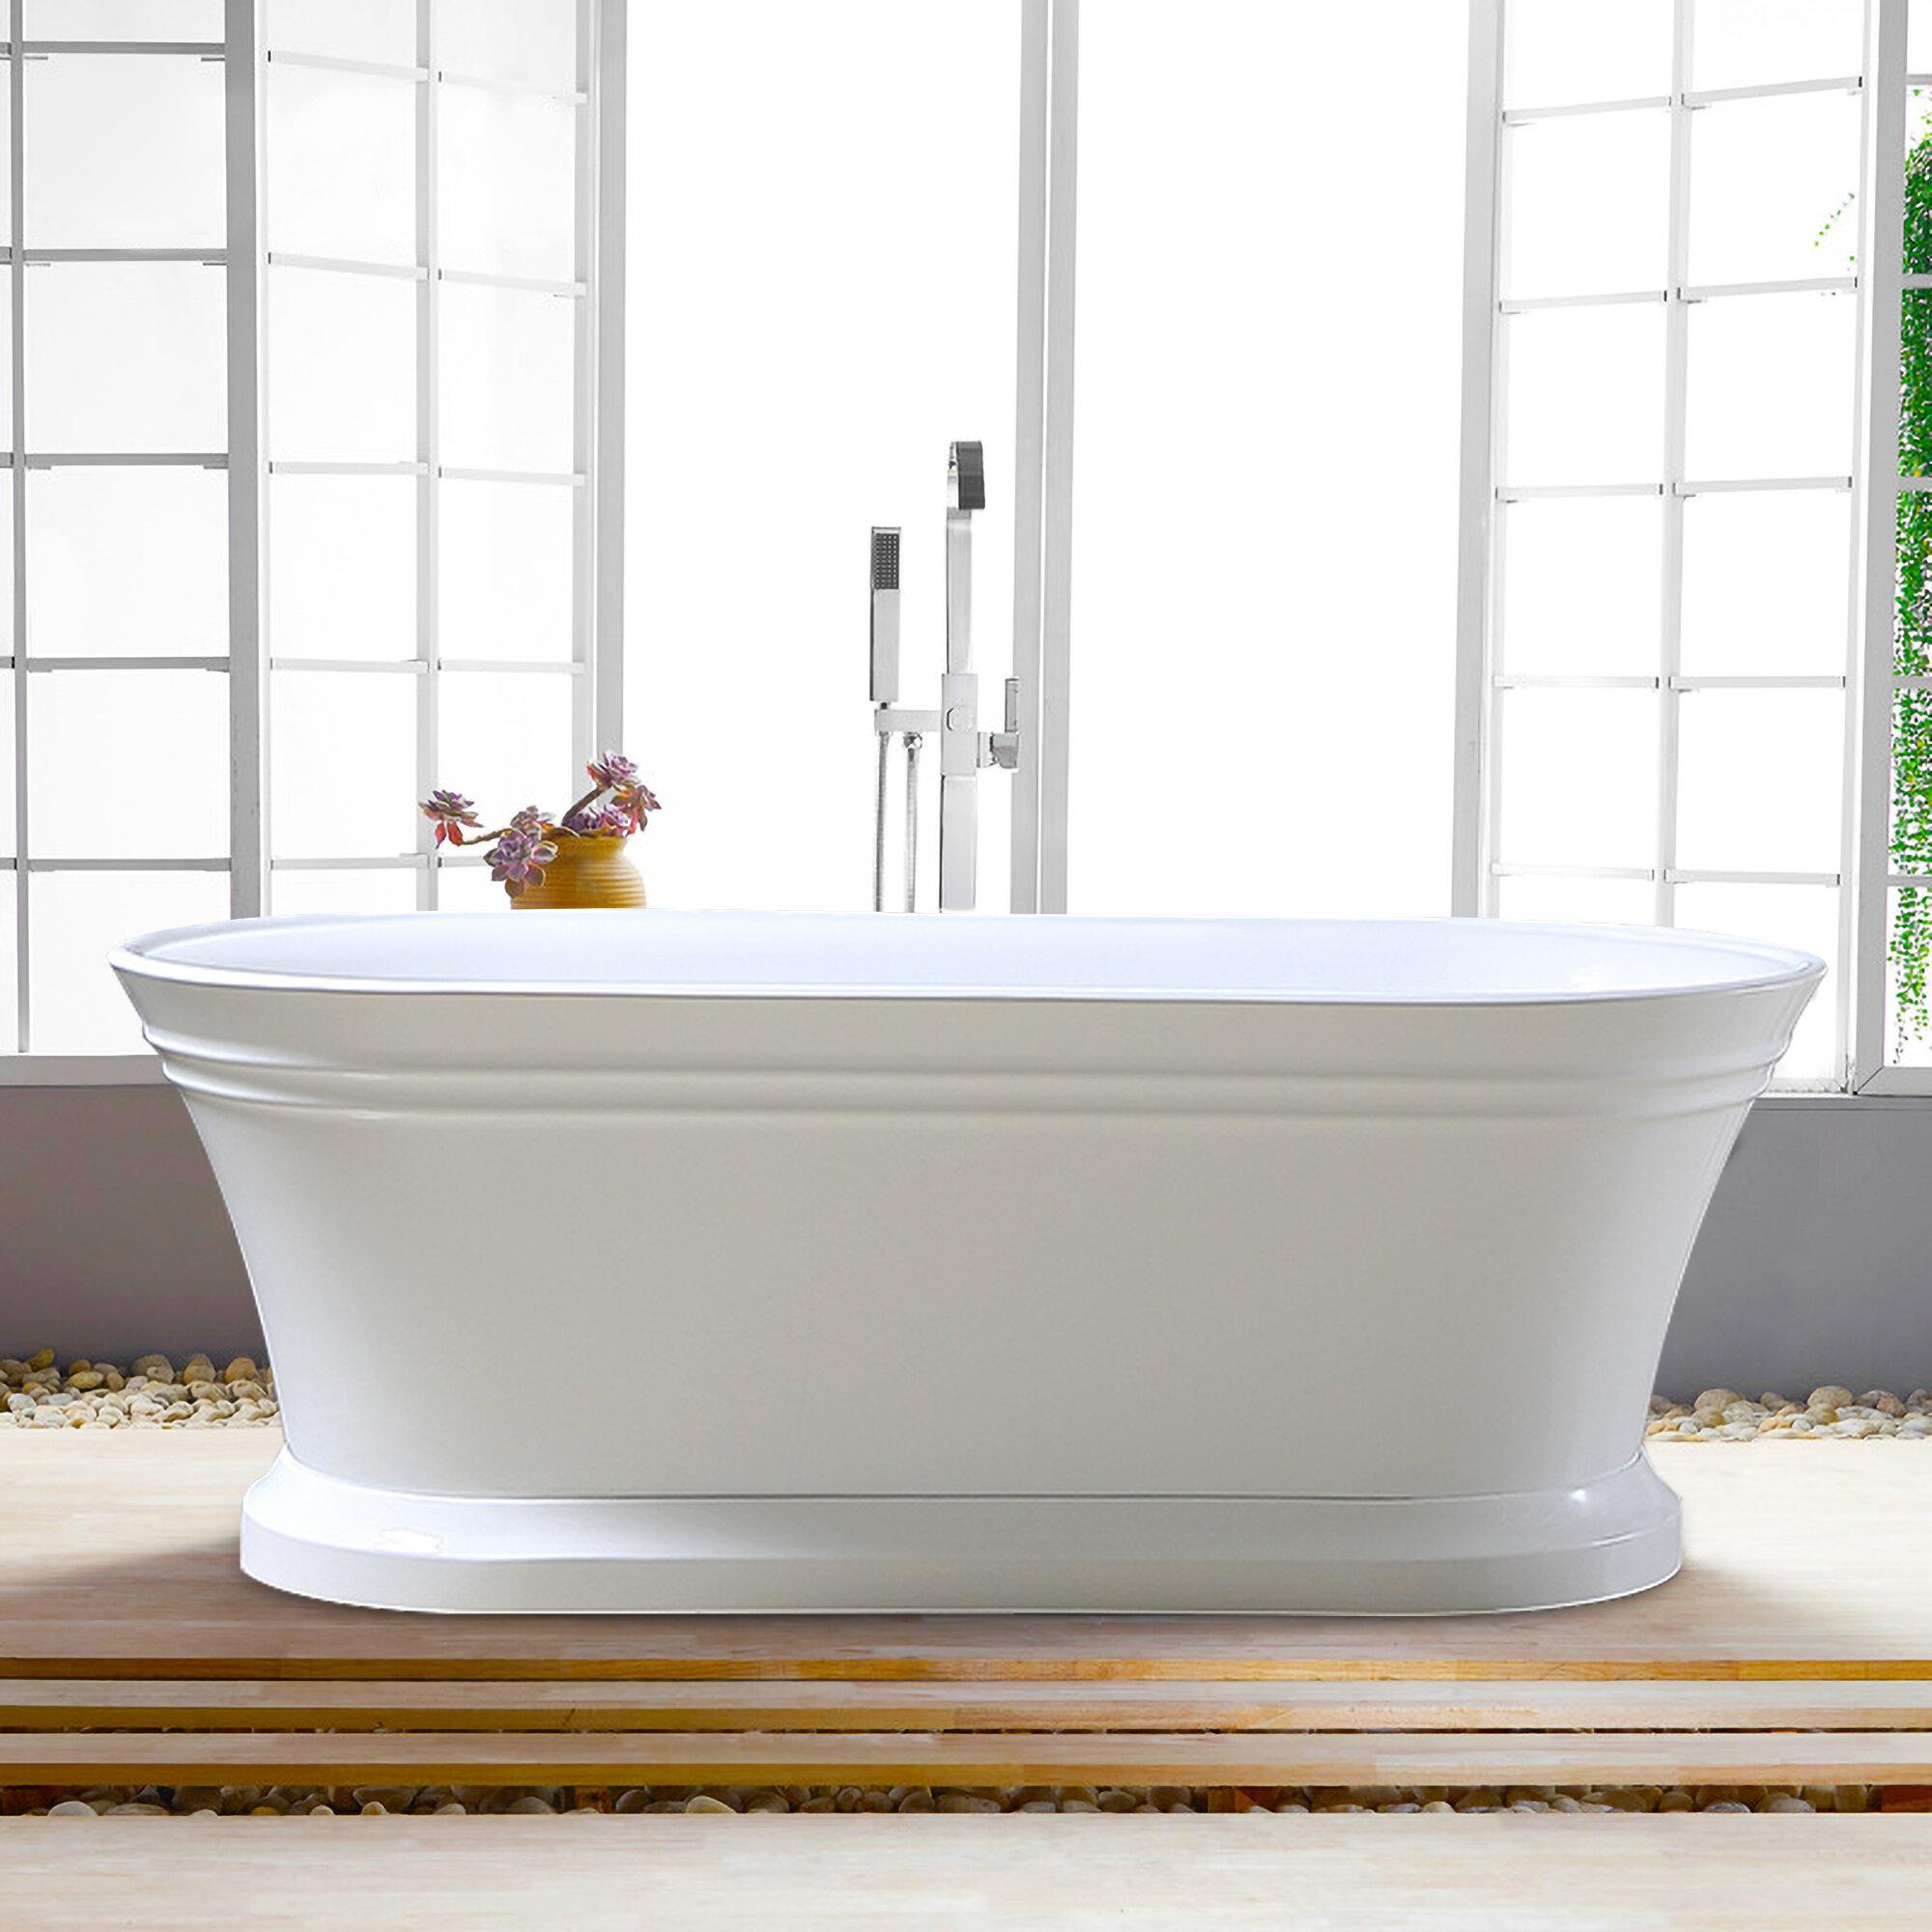 Vanity Art 67 X 31 Pedestal Soaking Bathtub Reviews Wayfair